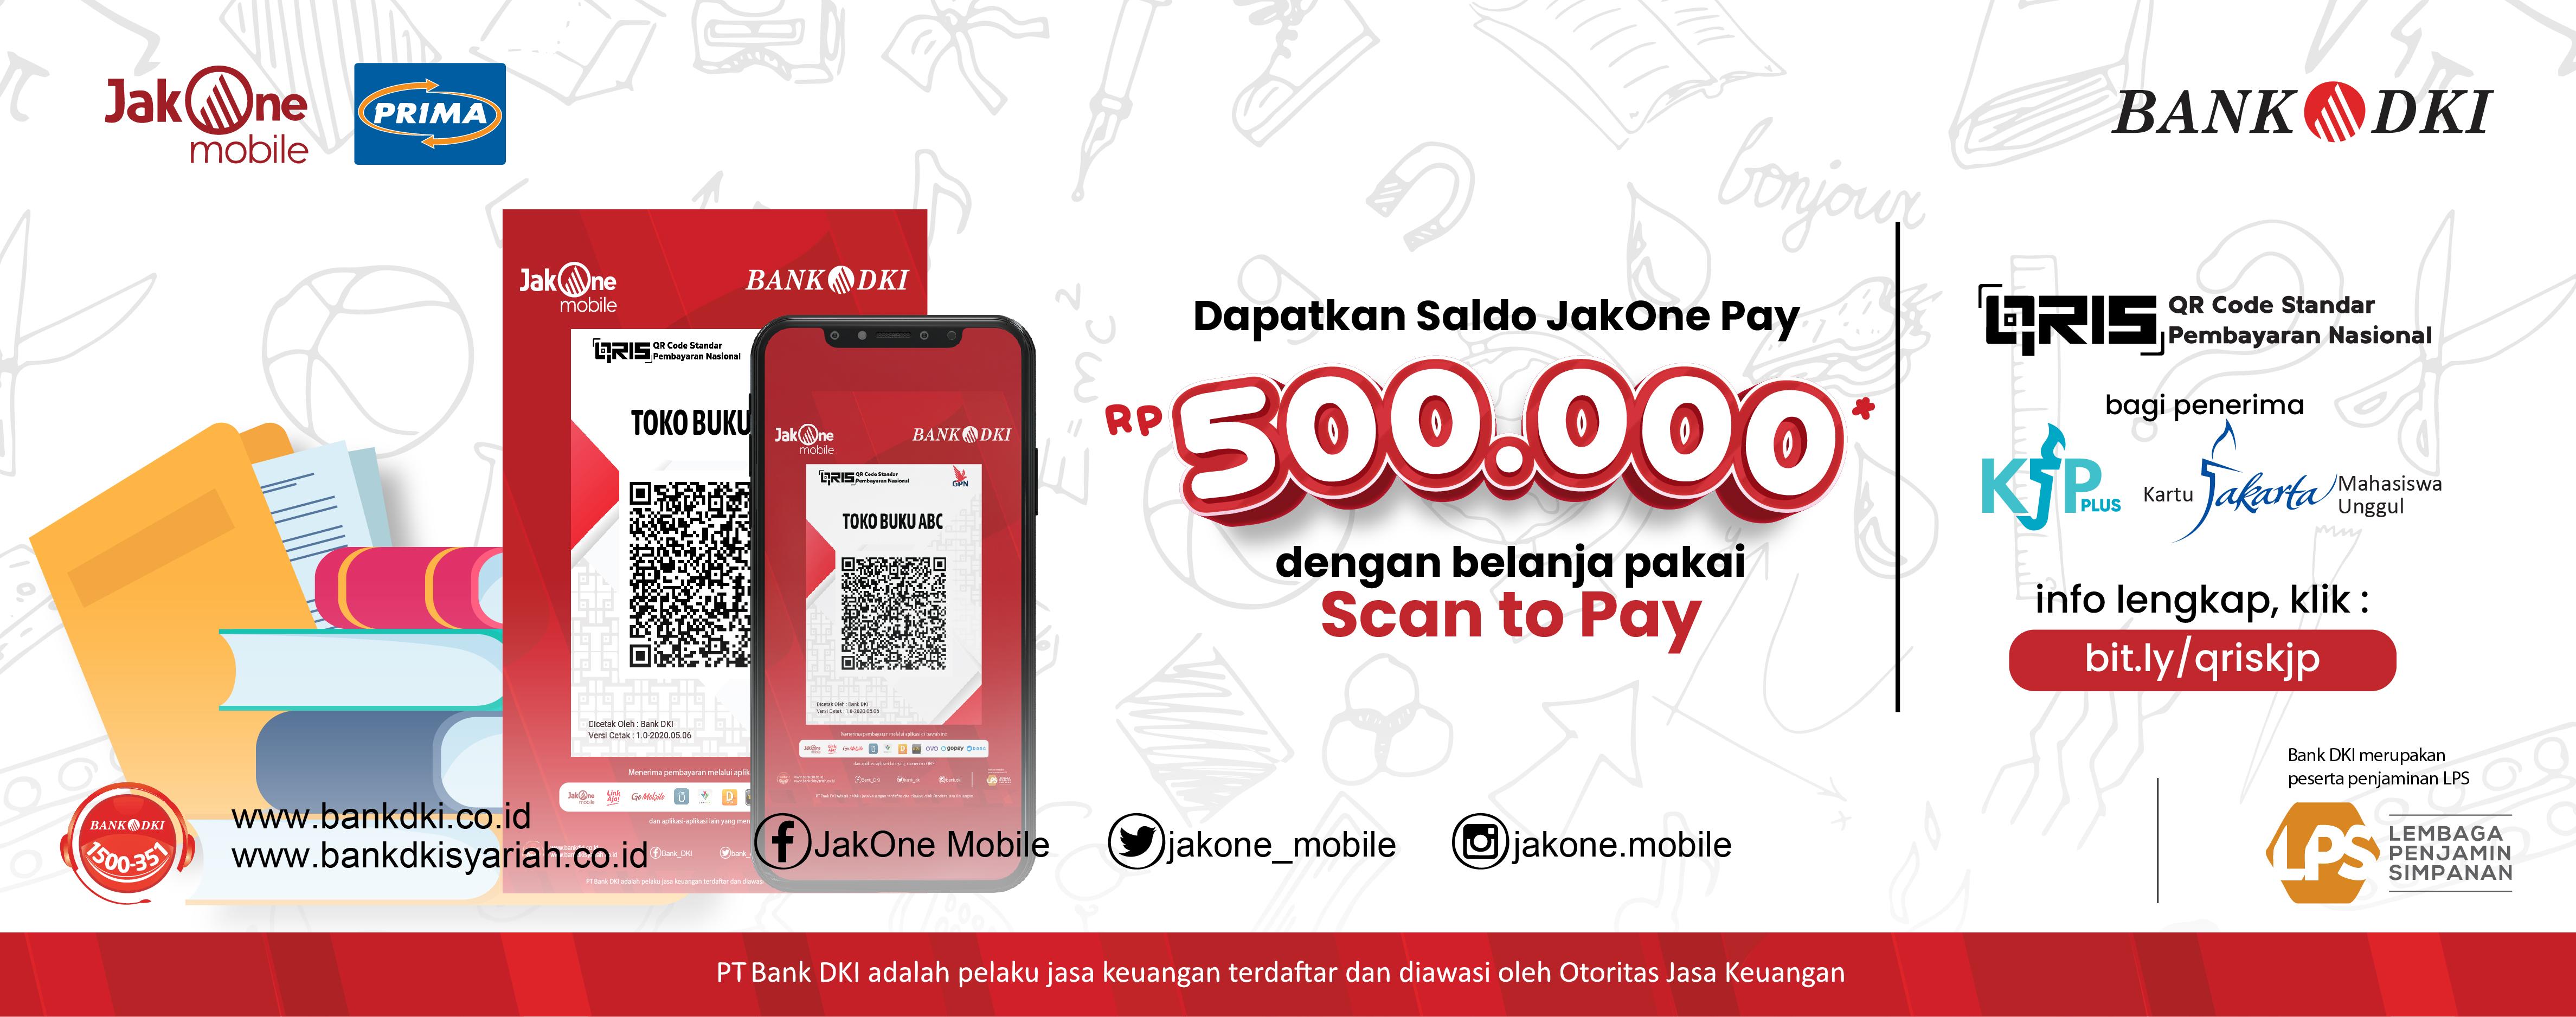 Dapat Saldo JakOne Pay Rp. 500.000